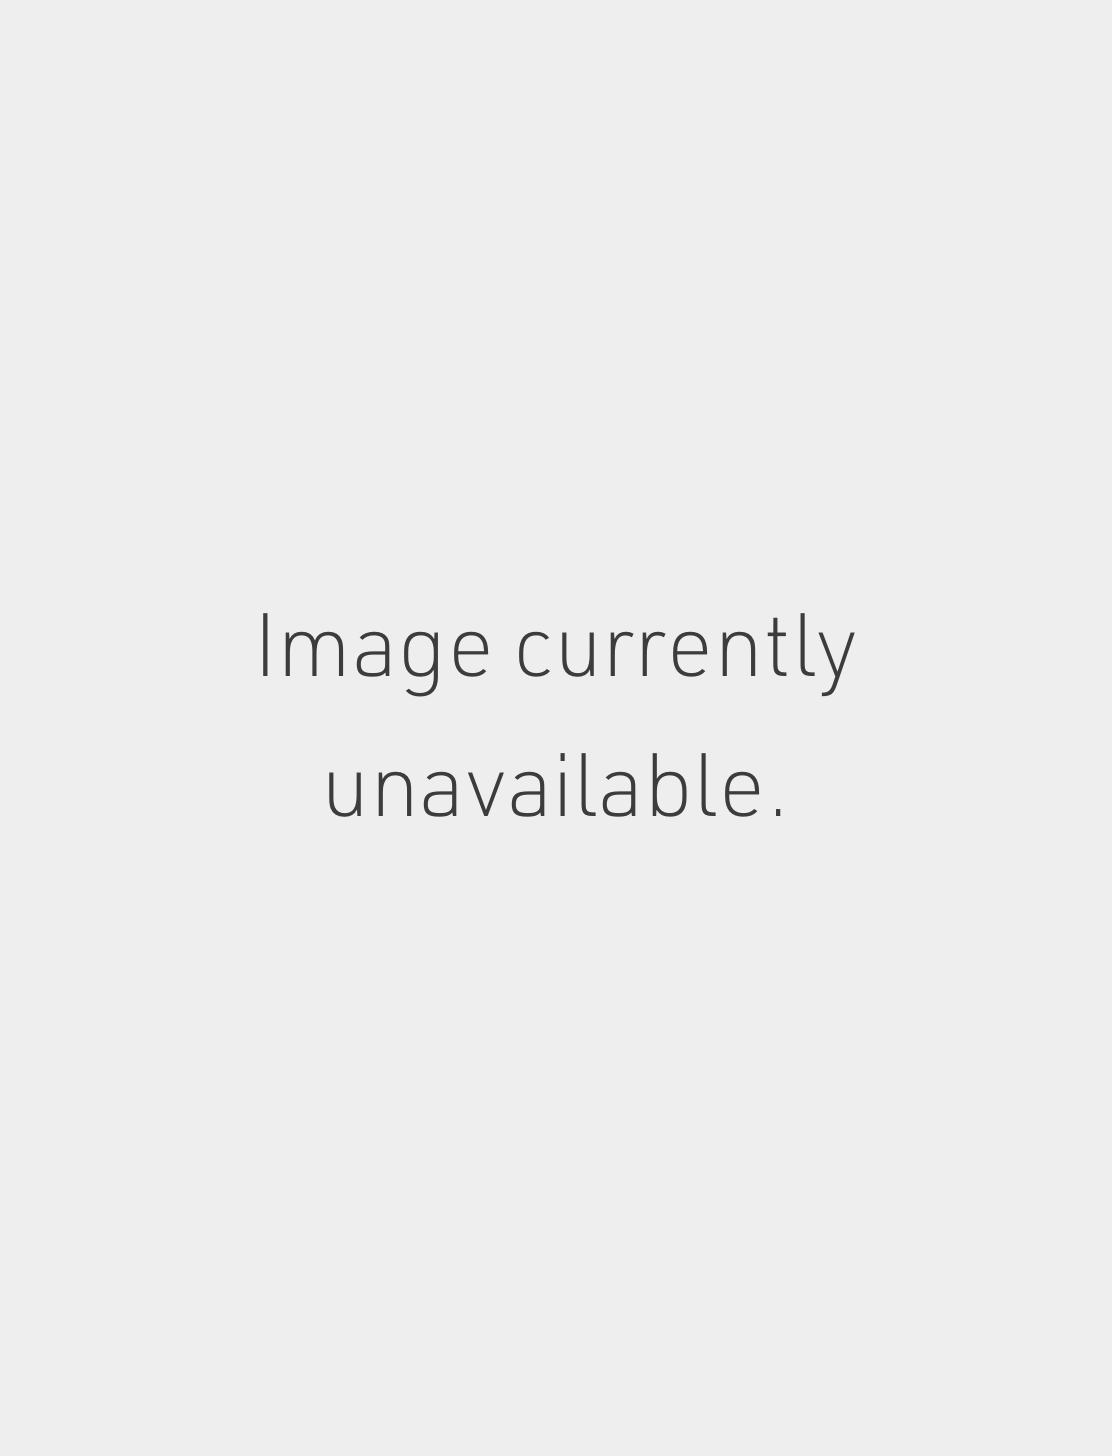 18k Lace Diamond Pave Eye Finger Ring Image #1